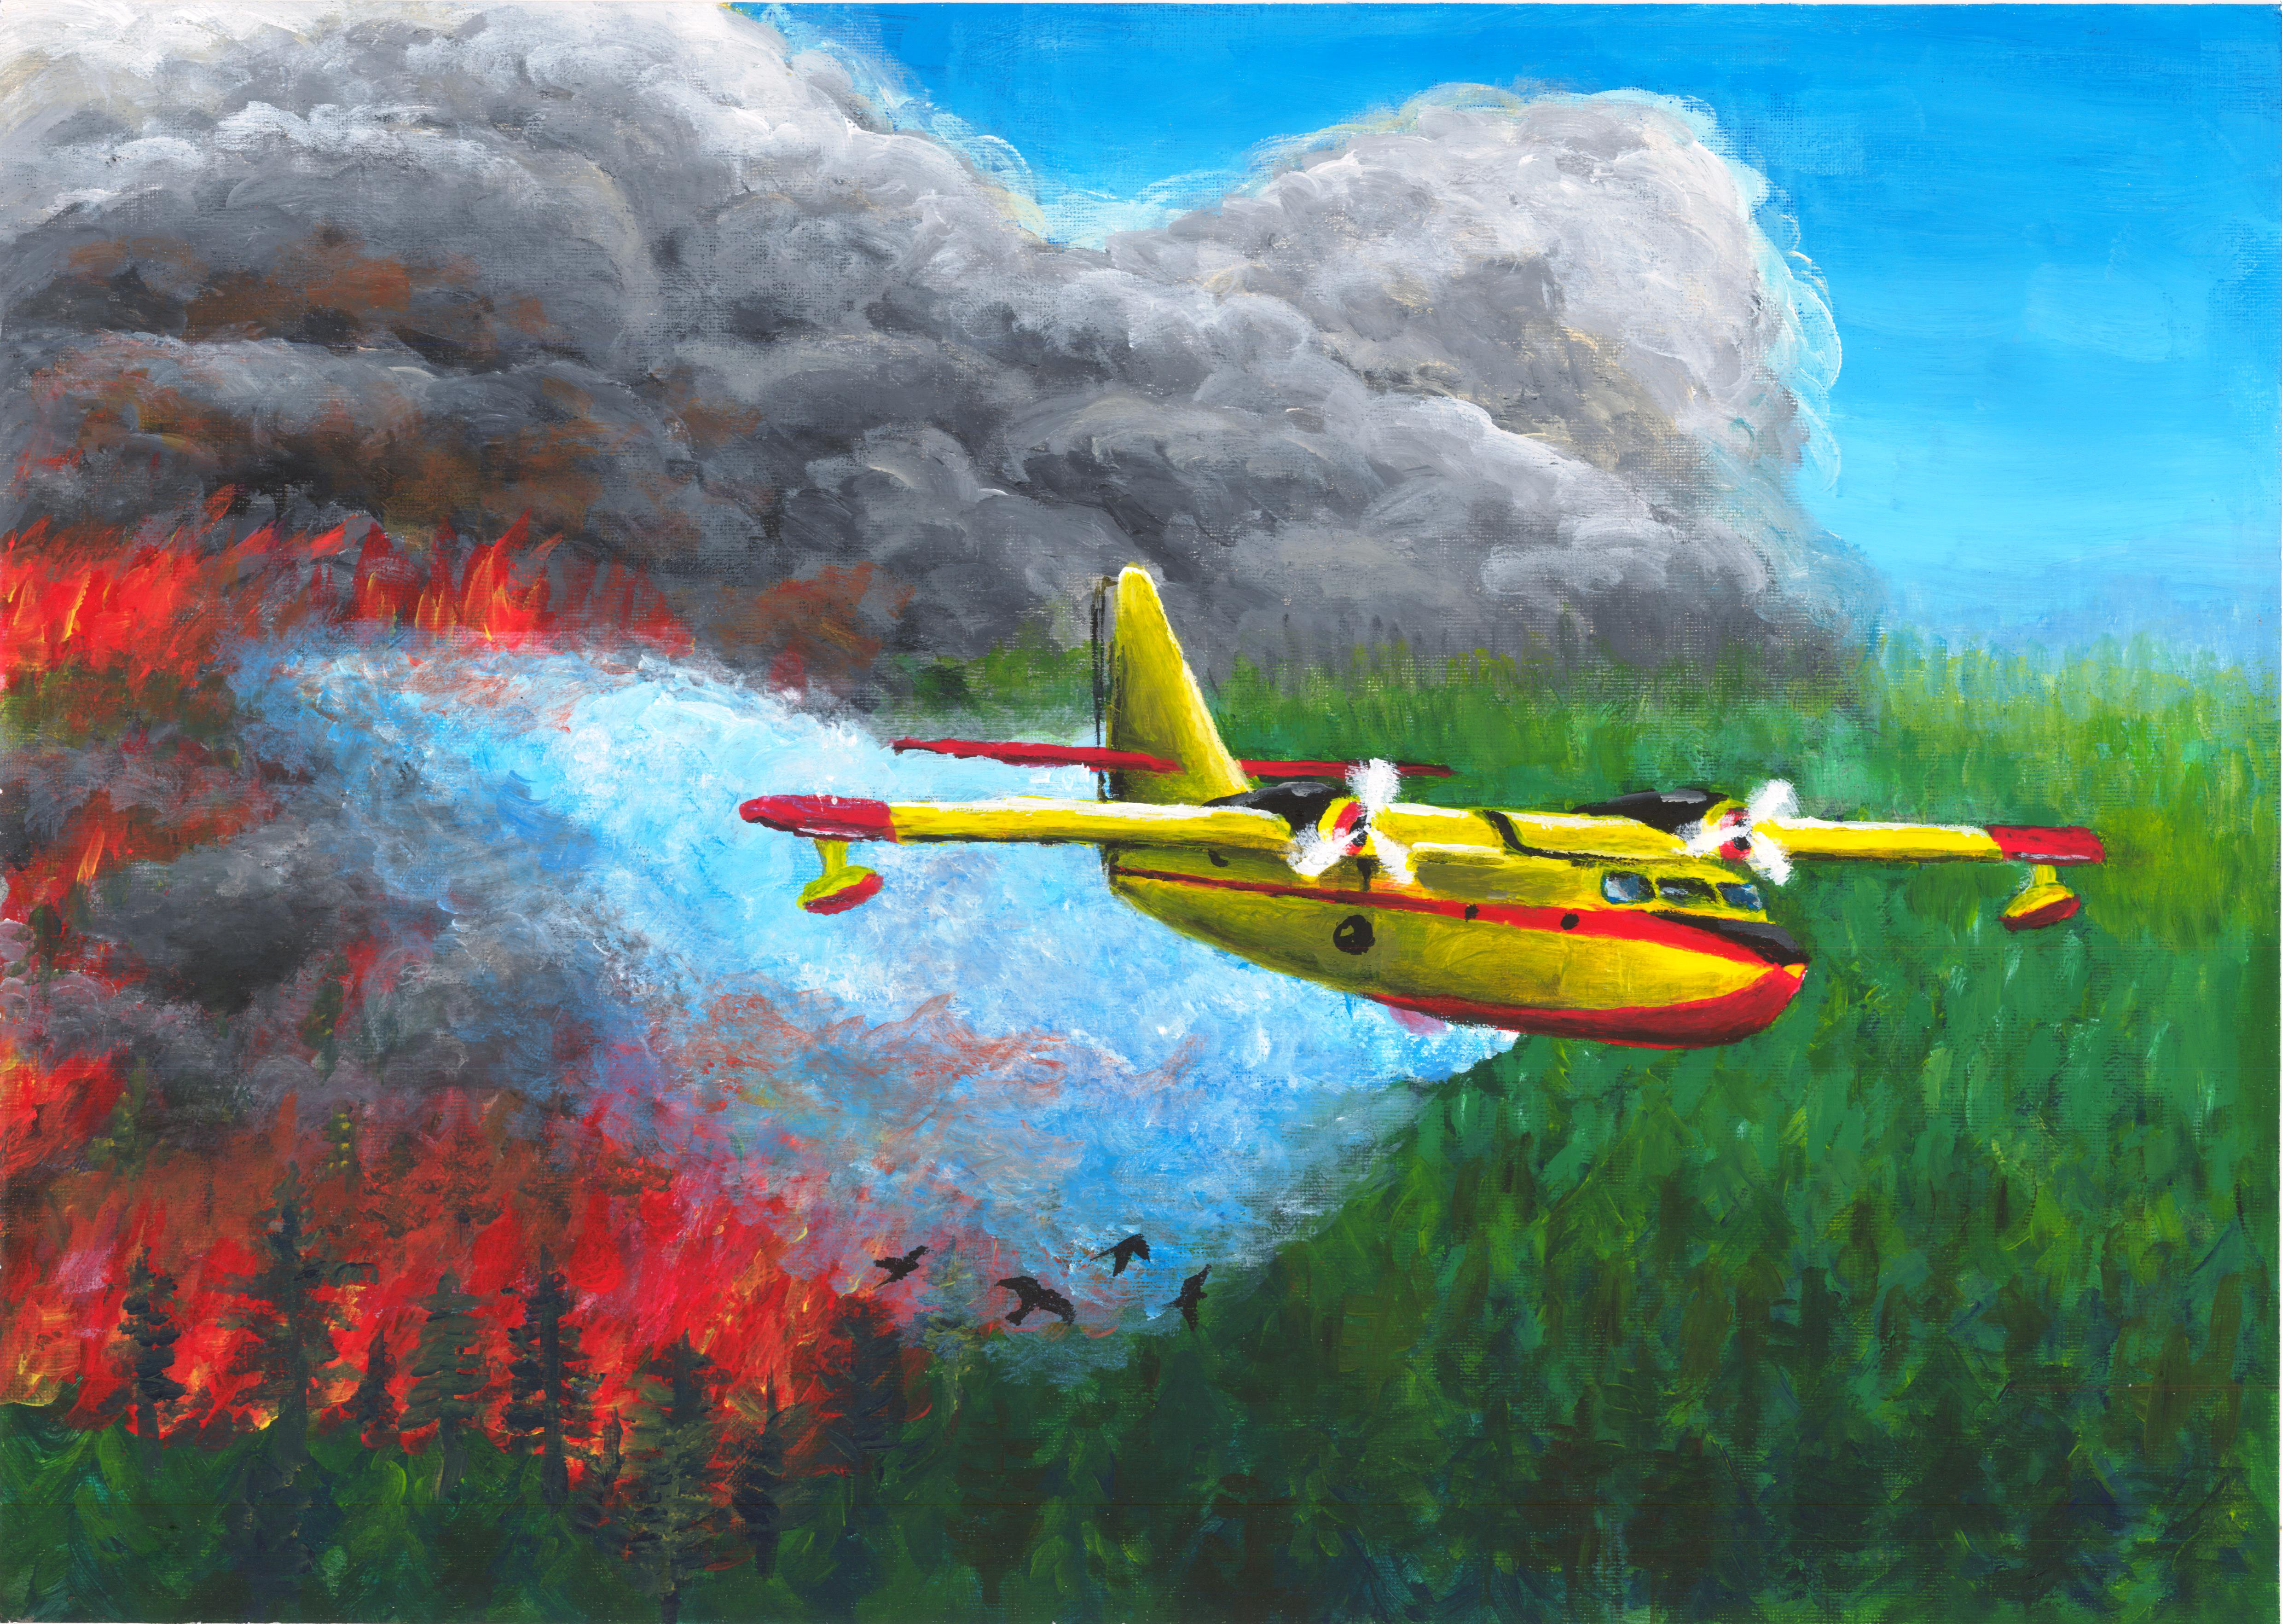 2014 Aviation Art Contest